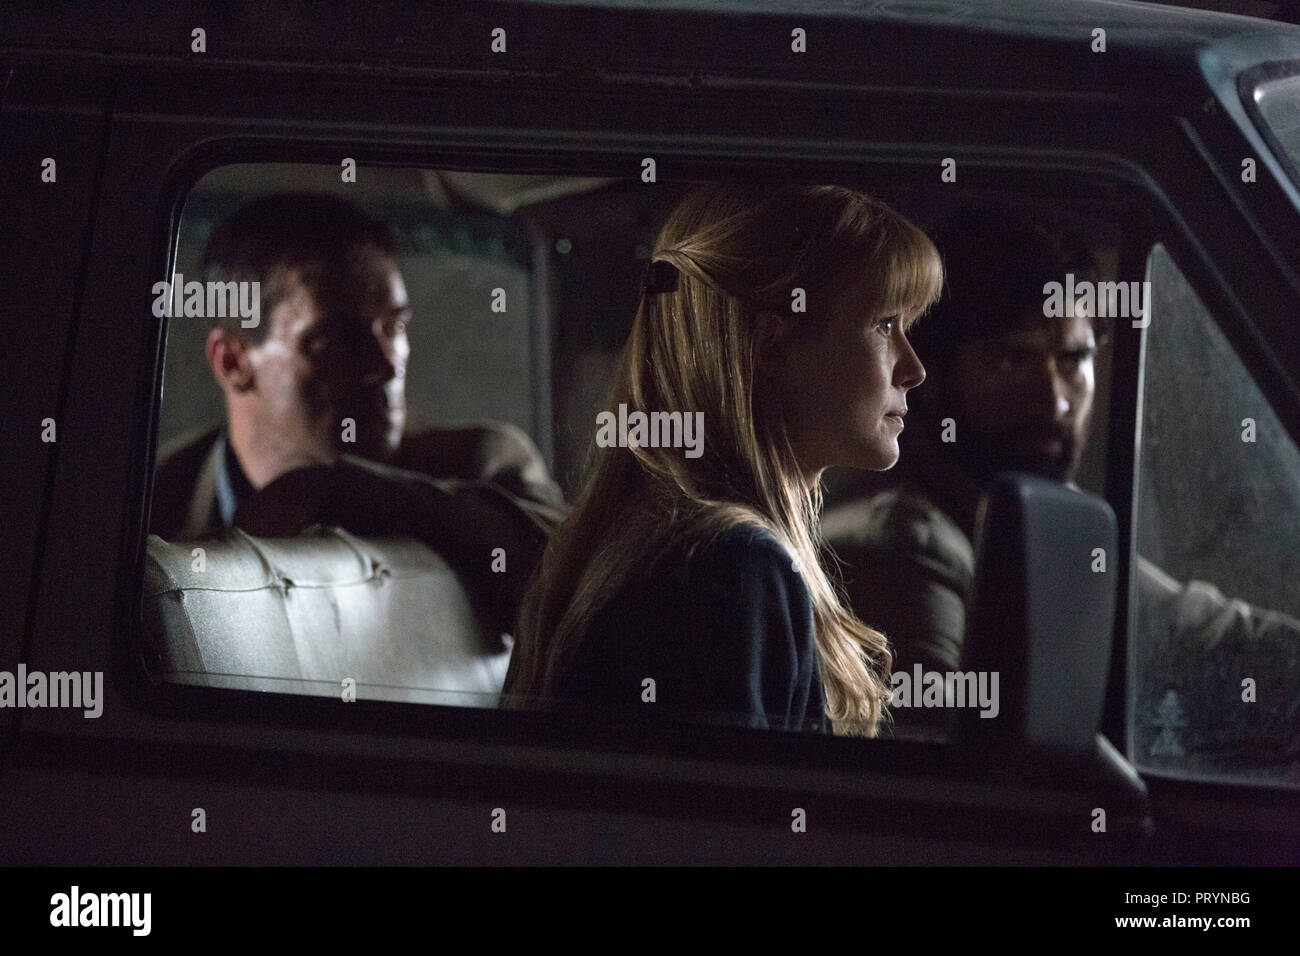 Prod DB © Warner Bros. - Radar Pictures - ShivHans Pictures / DR OPERATION BEYROUTH (BEIRUT) de Brad Anderson 2018 USA avec Rosamund Pike. espionnage, - Stock Image